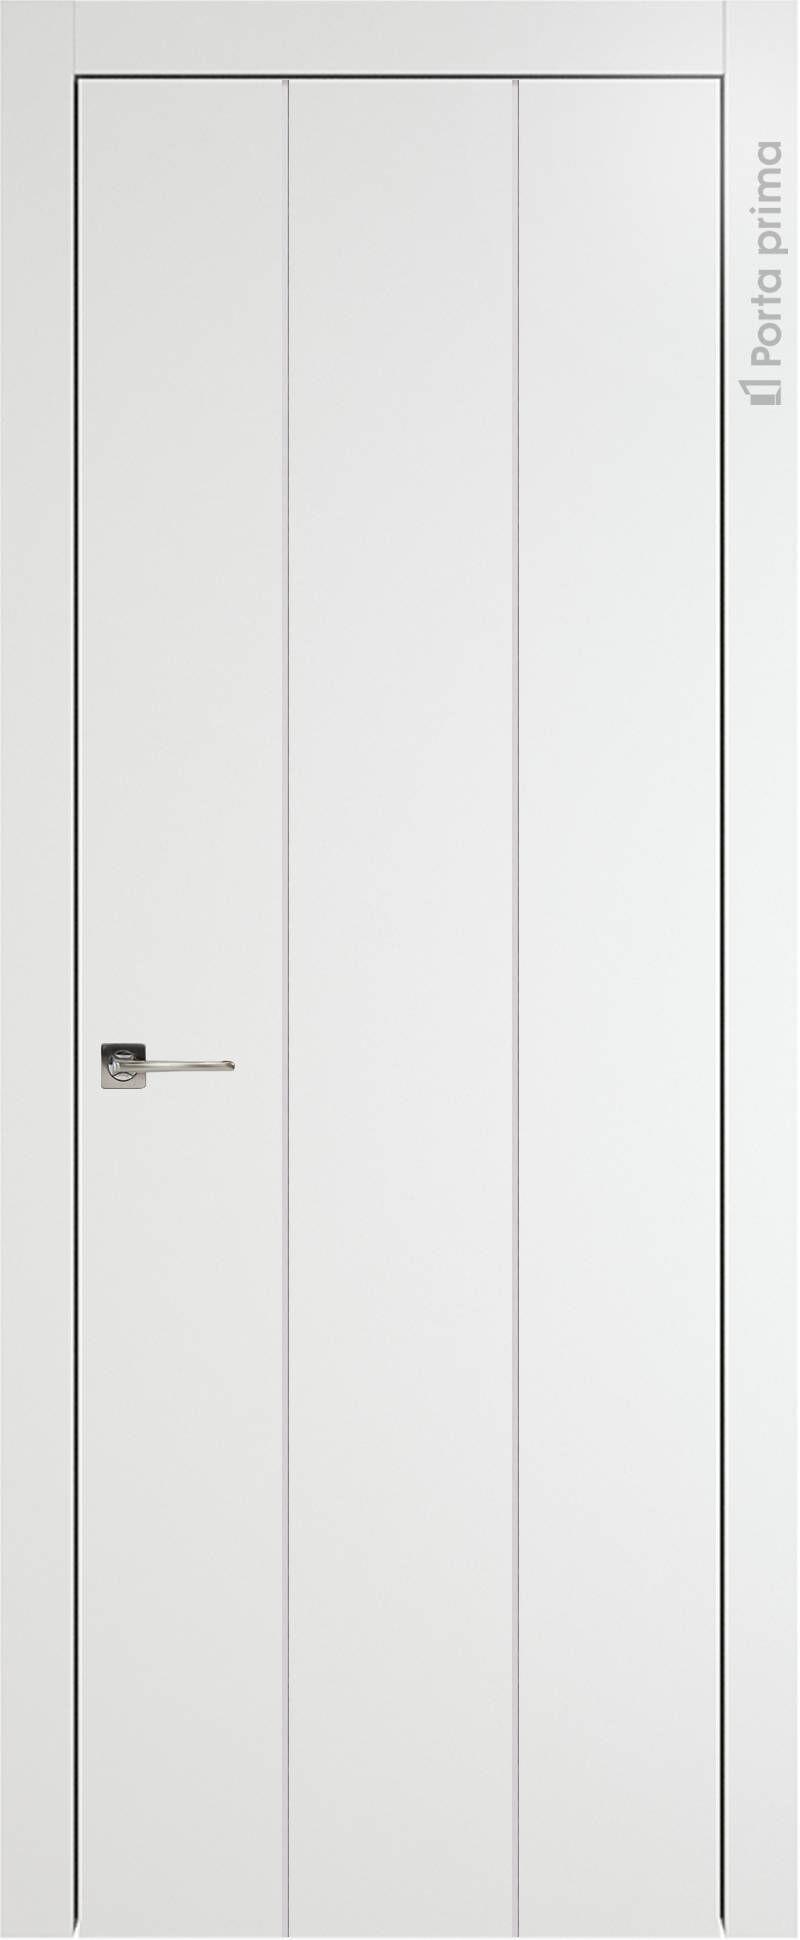 Tivoli Б-1 цвет - Белая эмаль (RAL 9003) Без стекла (ДГ)